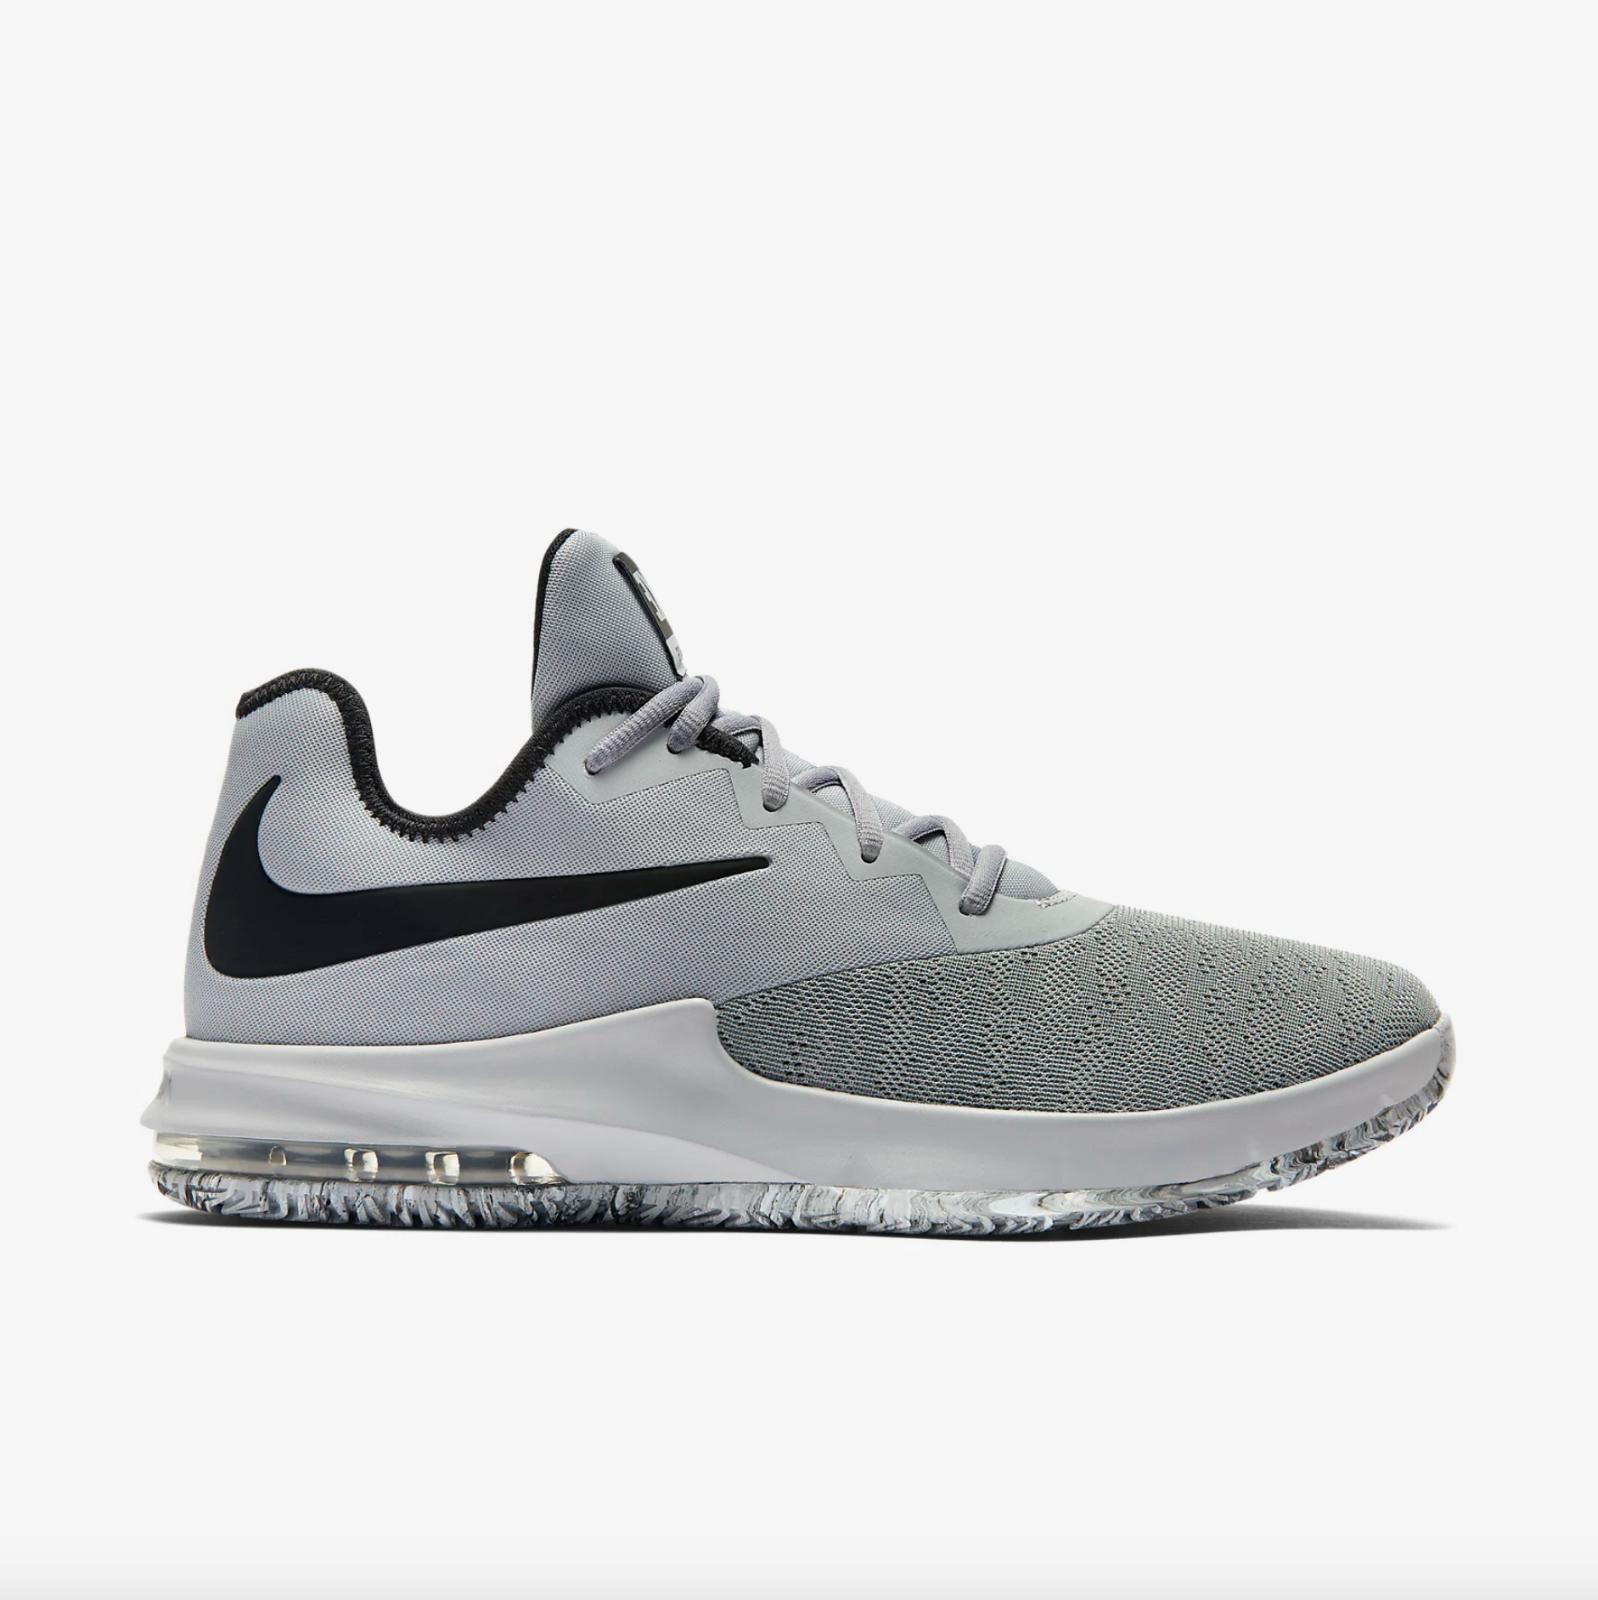 Nike Air Max 90 Essential gris Homme Baskets 661499